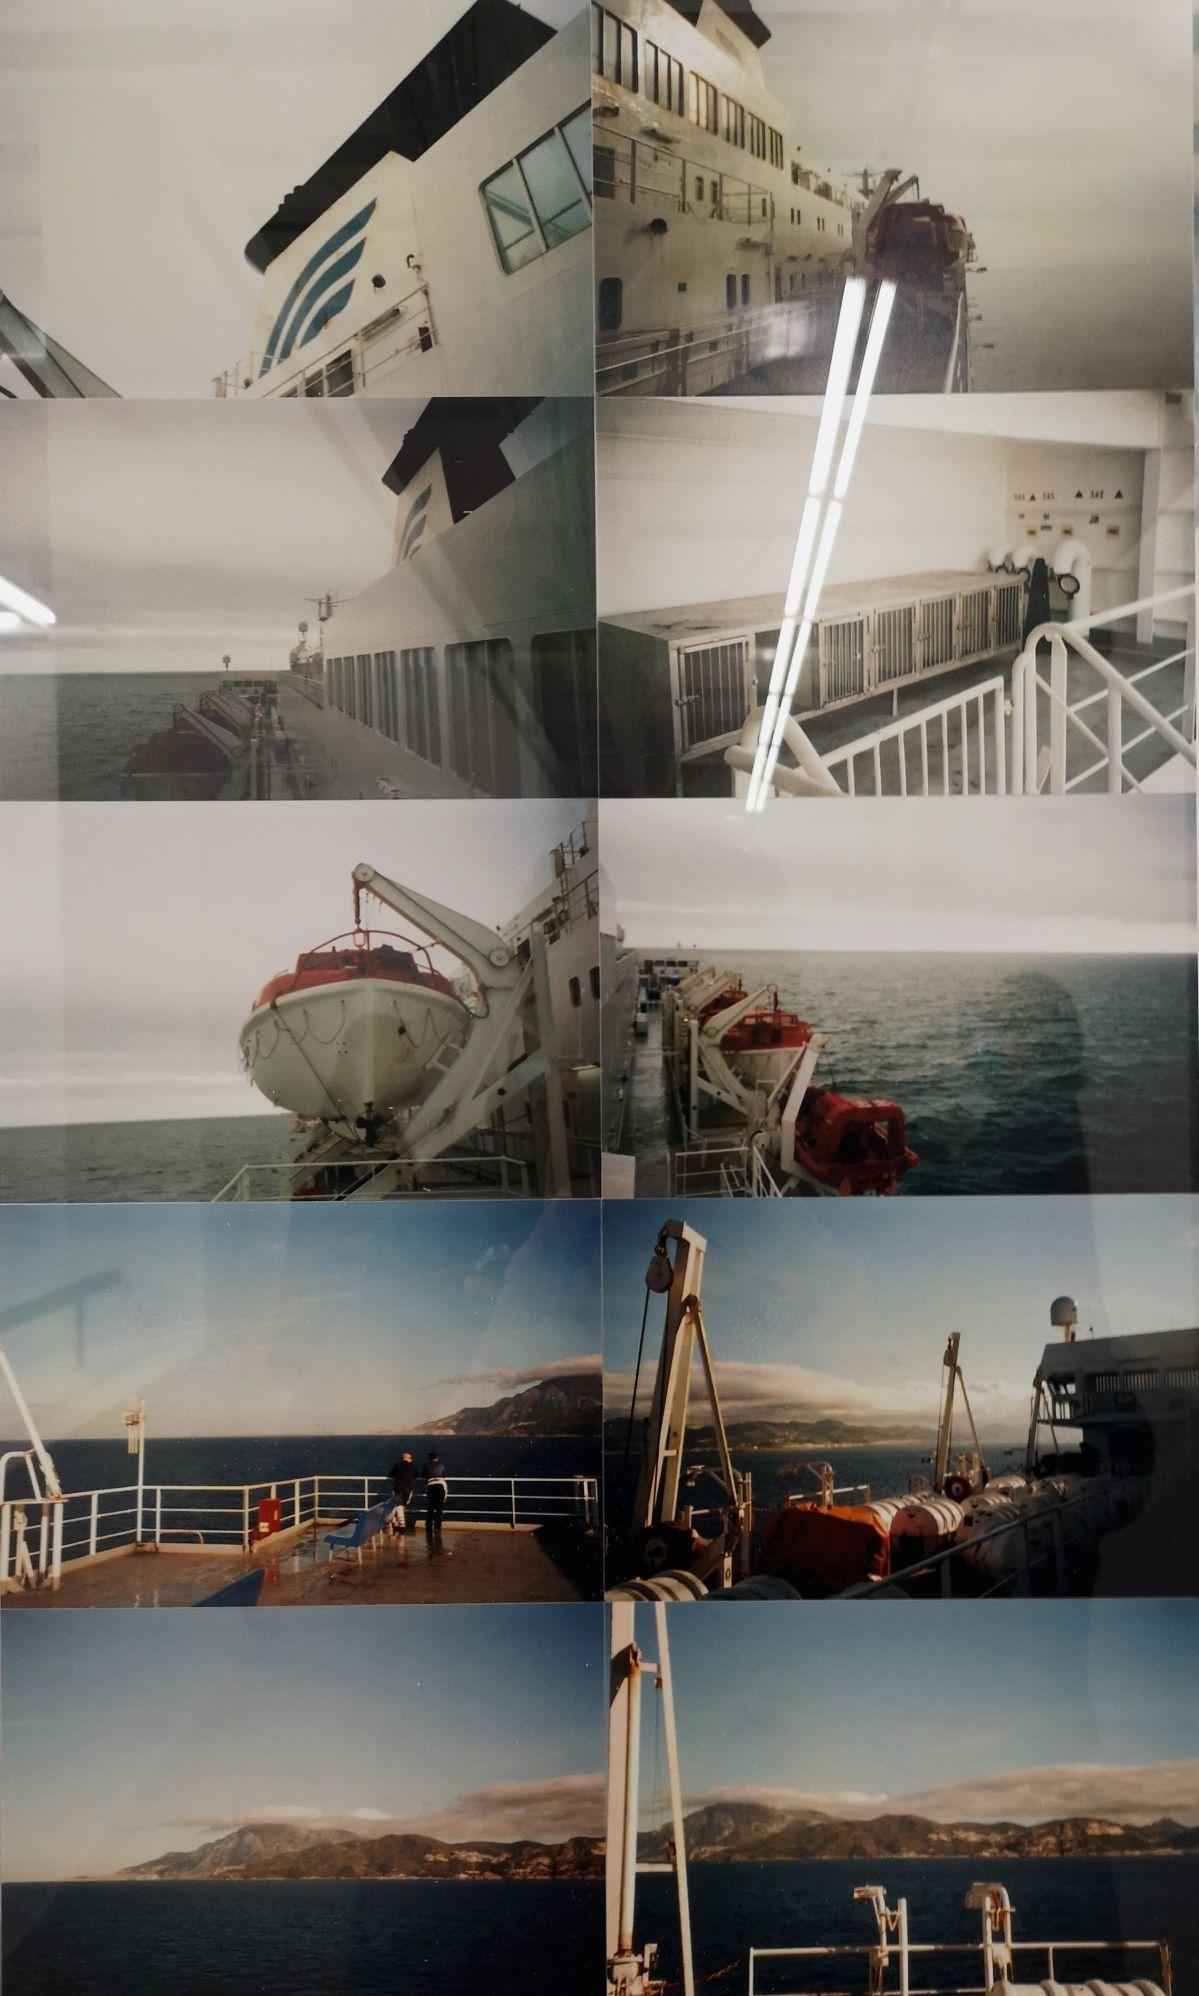 Than Hussein Clark - The Poet James Loop and the Artist Benjamin Edwin Slinger Enact the Mediterranean Crossing Reversal, 2020